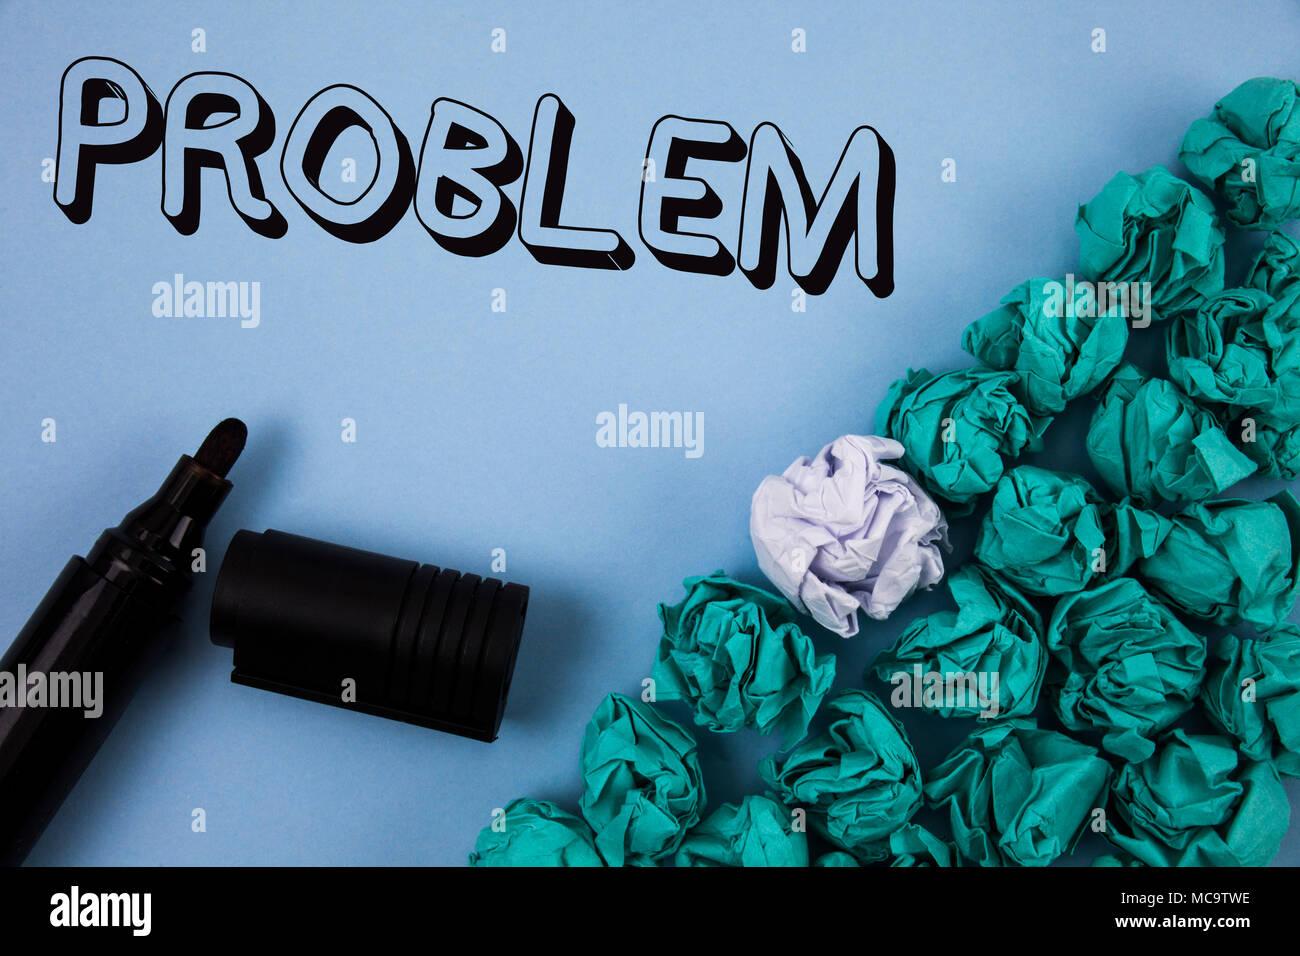 Problema de texto de escritura a mano. Concepto Significado problemas que necesitan ser resueltos Situación Difícil complicación escrito de fondo azul liso papel arrugado Imagen De Stock